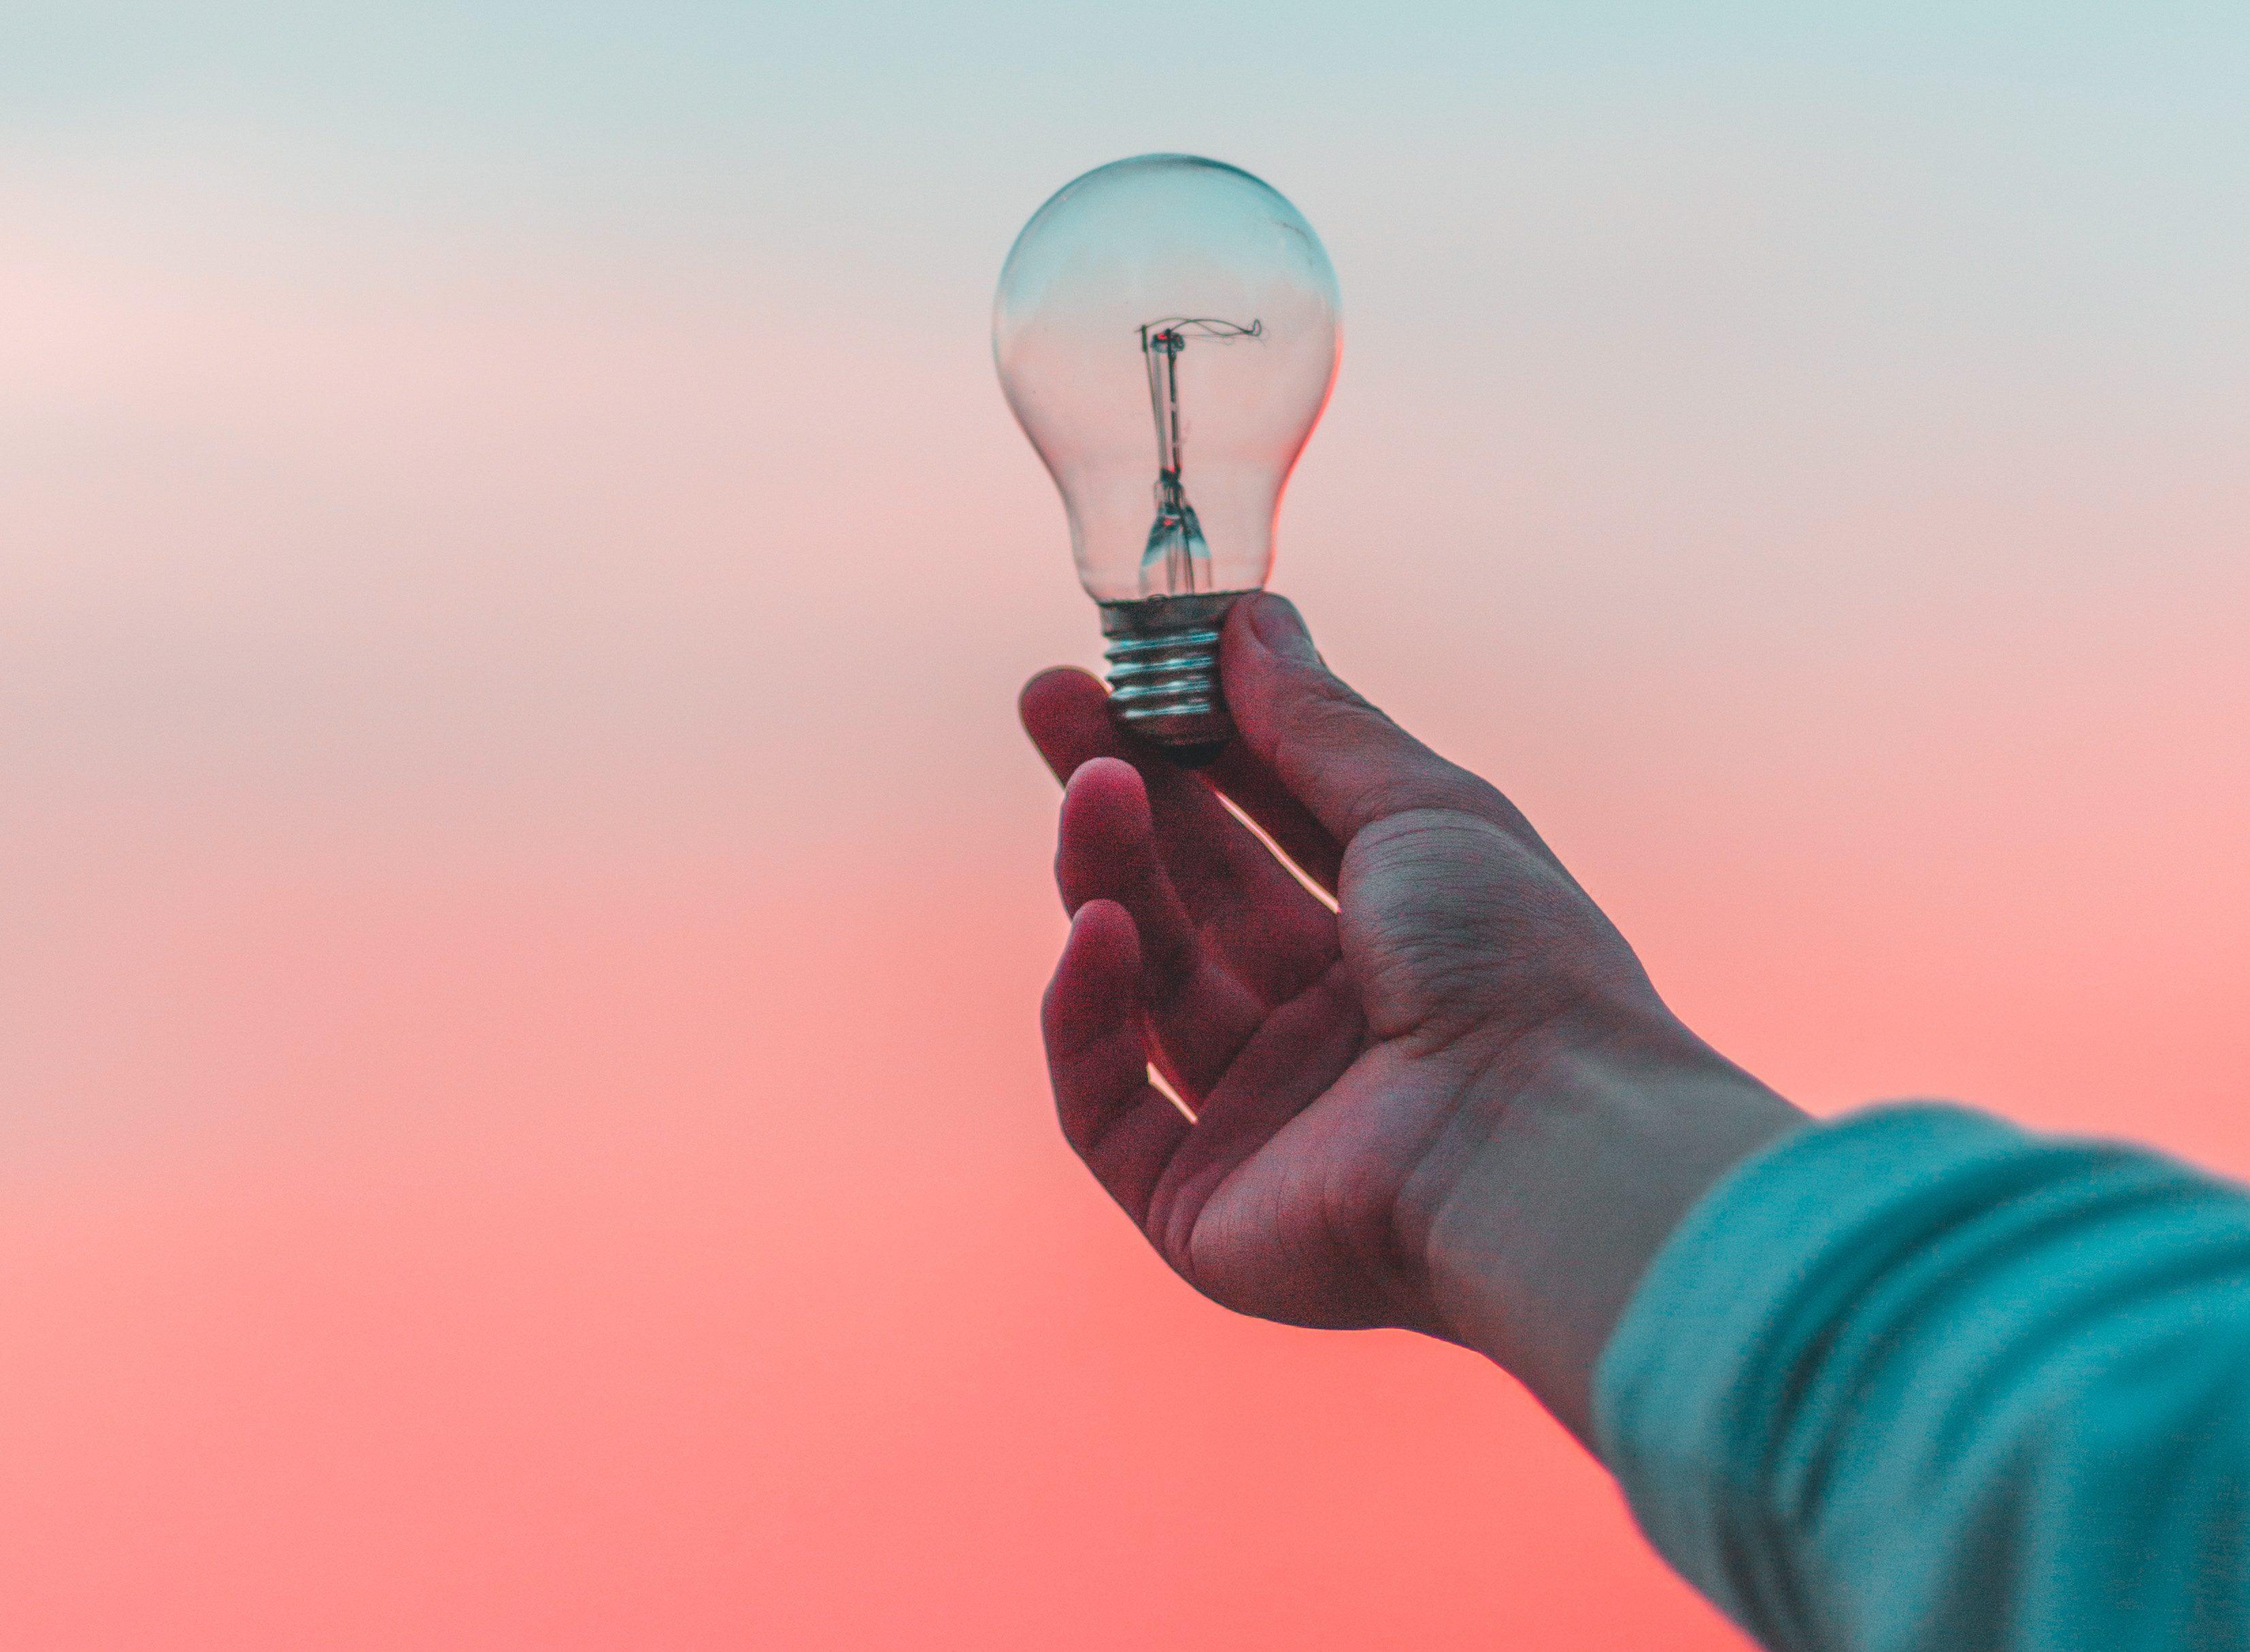 hand holding up a lightbulb